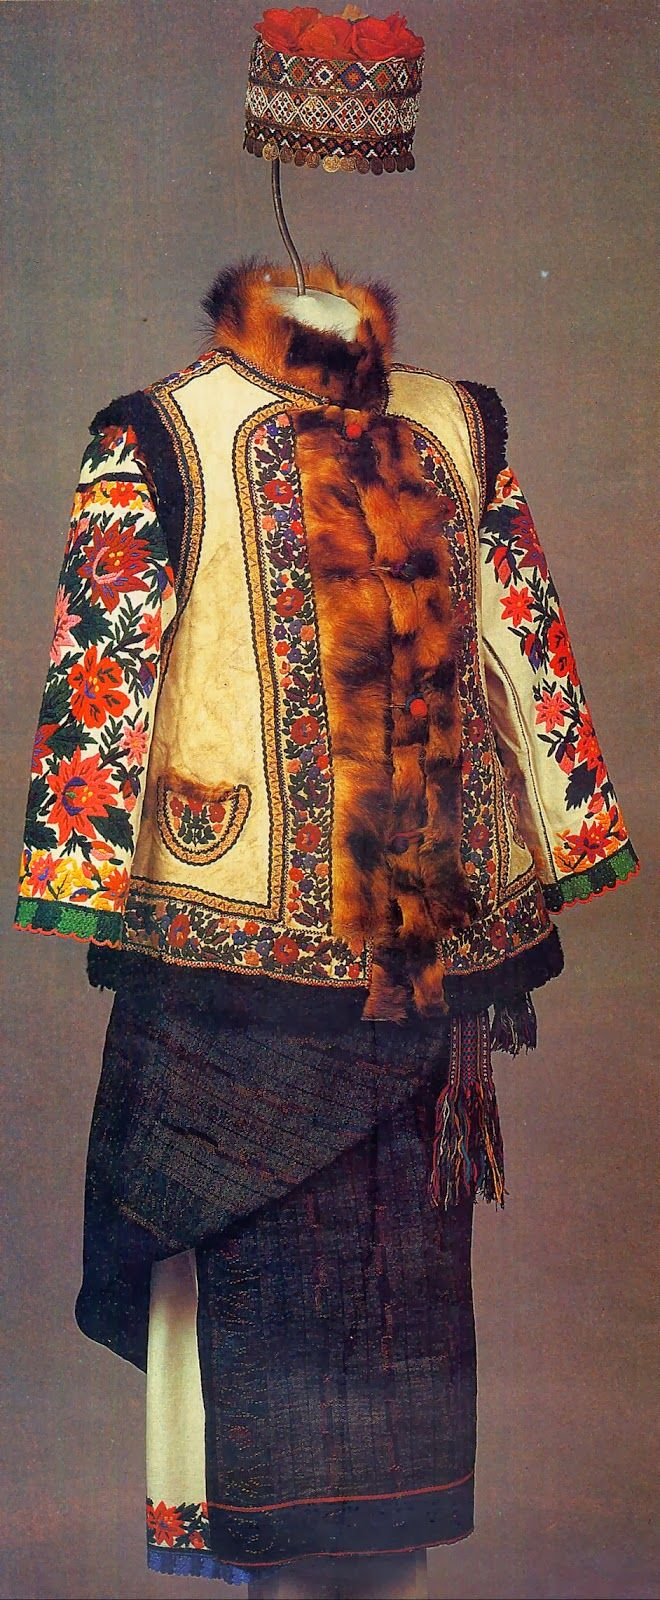 FolkCostume & Embroidery ~ Bukovyna, Ukraine